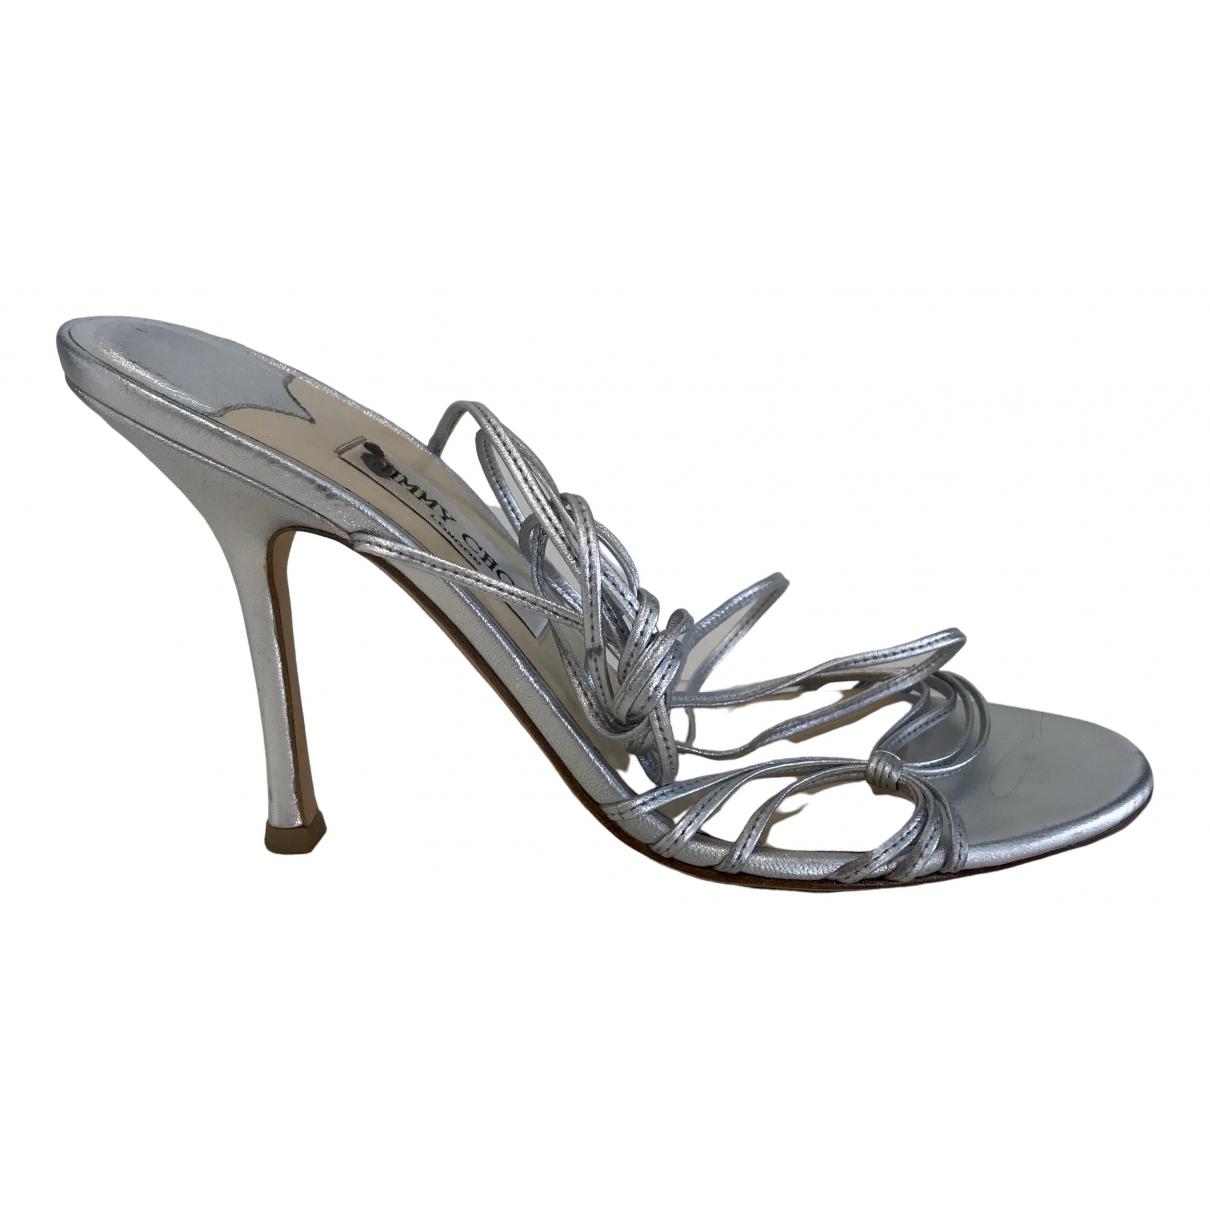 Jimmy Choo \N Silver Leather Sandals for Women 40.5 IT